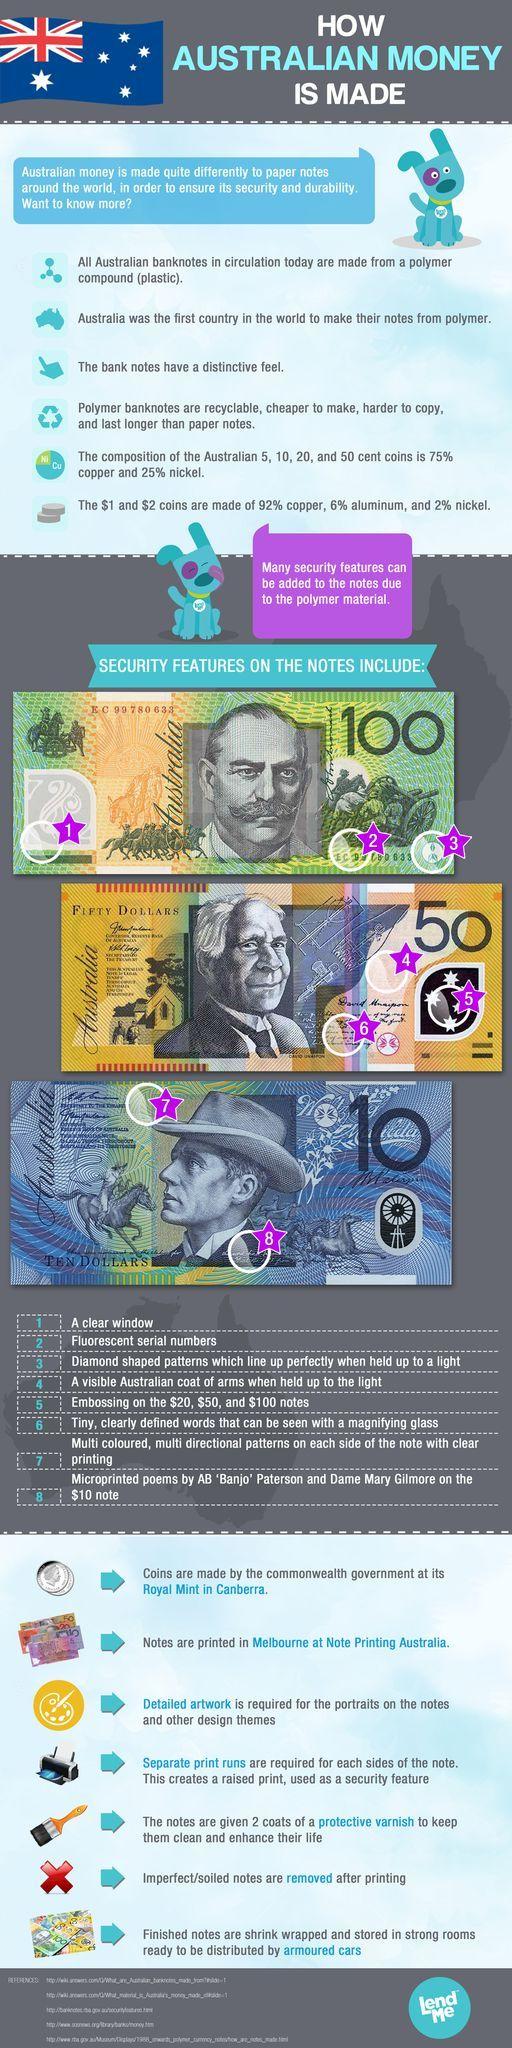 How Australian Money is Made #Infographic #Australia #Money - want more? check http://binaryblog.net !